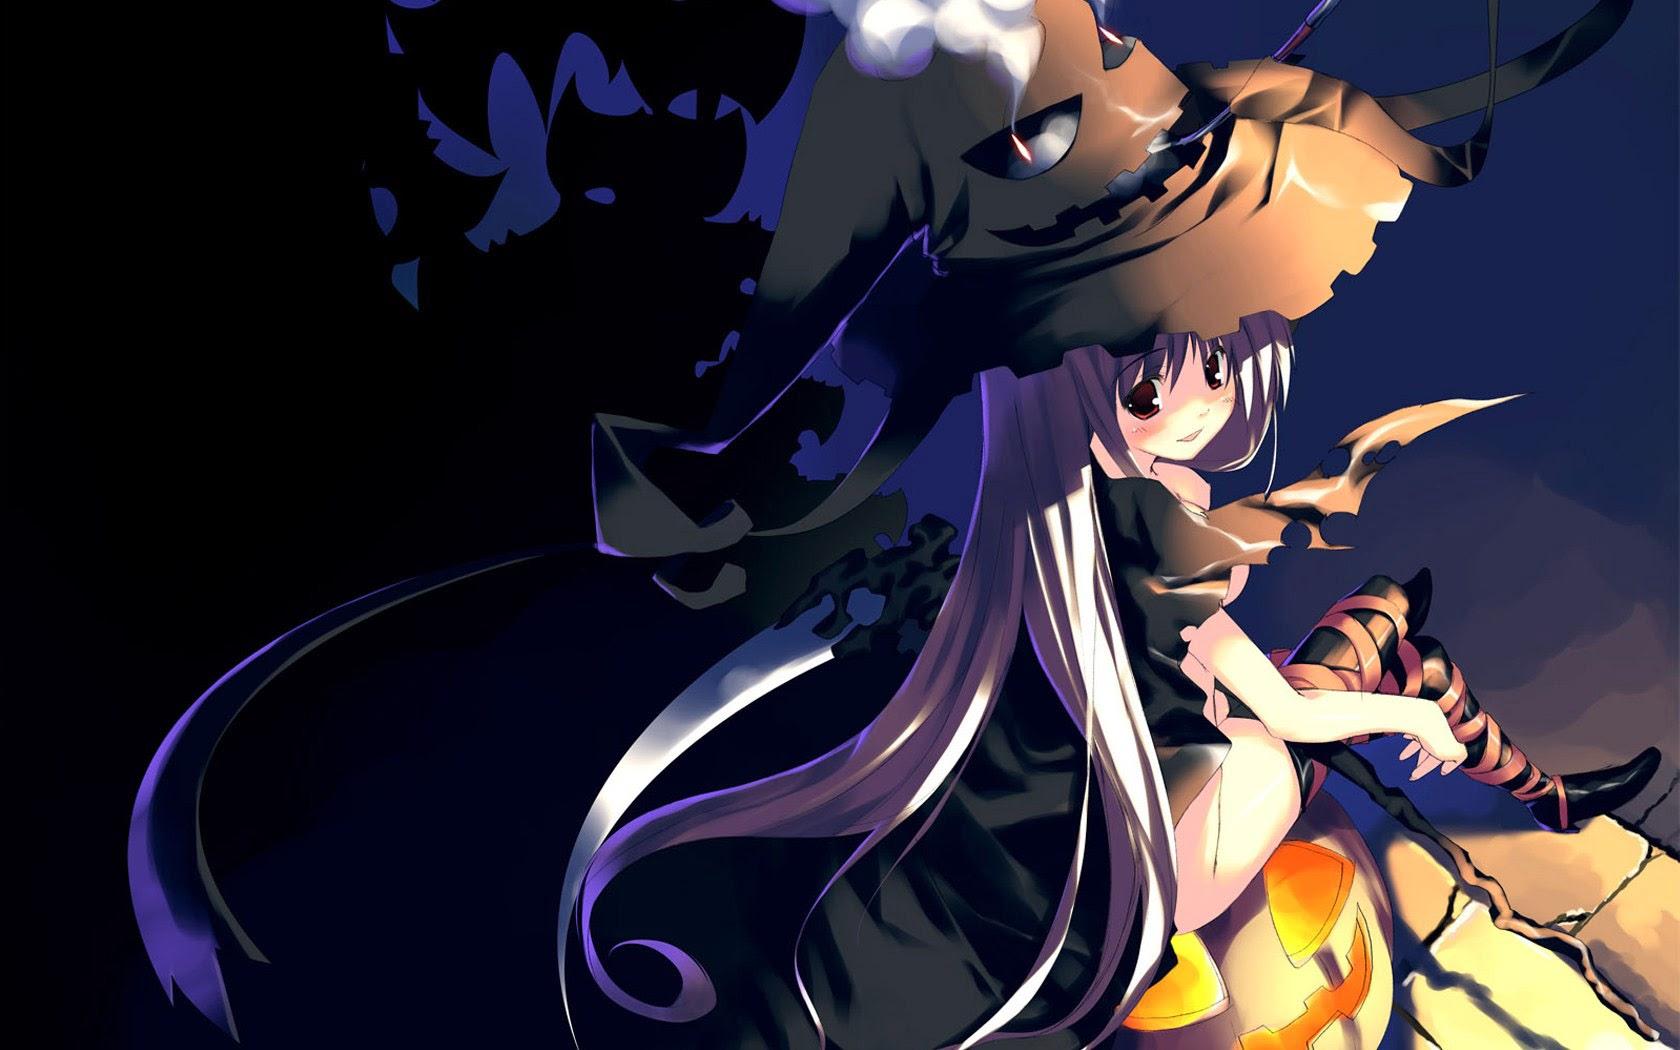 sexy girl witch halloween anime wallpaper 16801050 widescreen a153 1680x1050